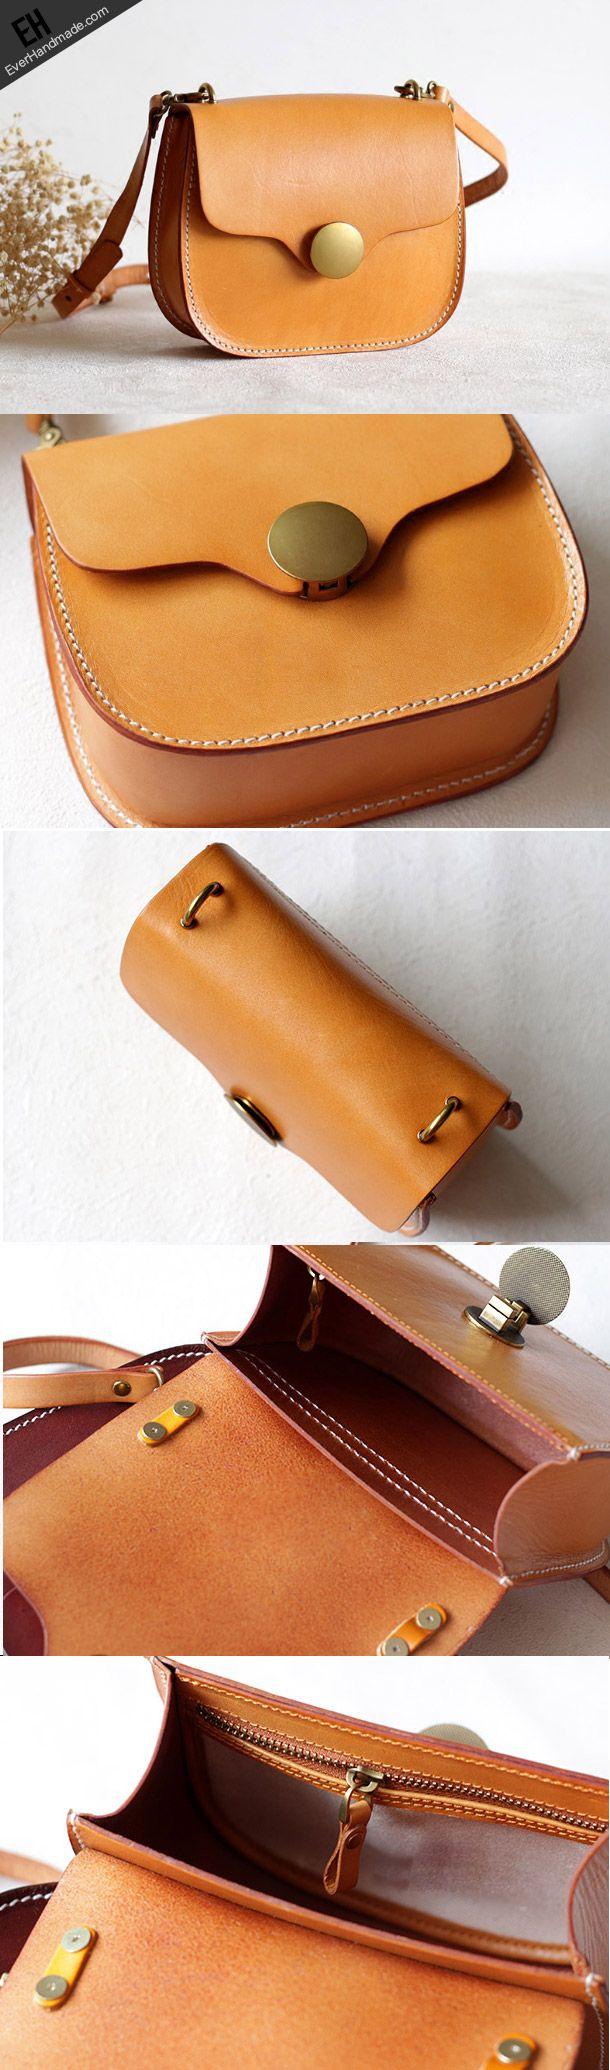 57 Best Baggs Images On Pinterest Briefcases Leather Backpacks Nucelle Women Purse Satchel Shoulder Bag Handbag Lock Gorgeous Glitter Elegant Blue Handmade For Crossbody